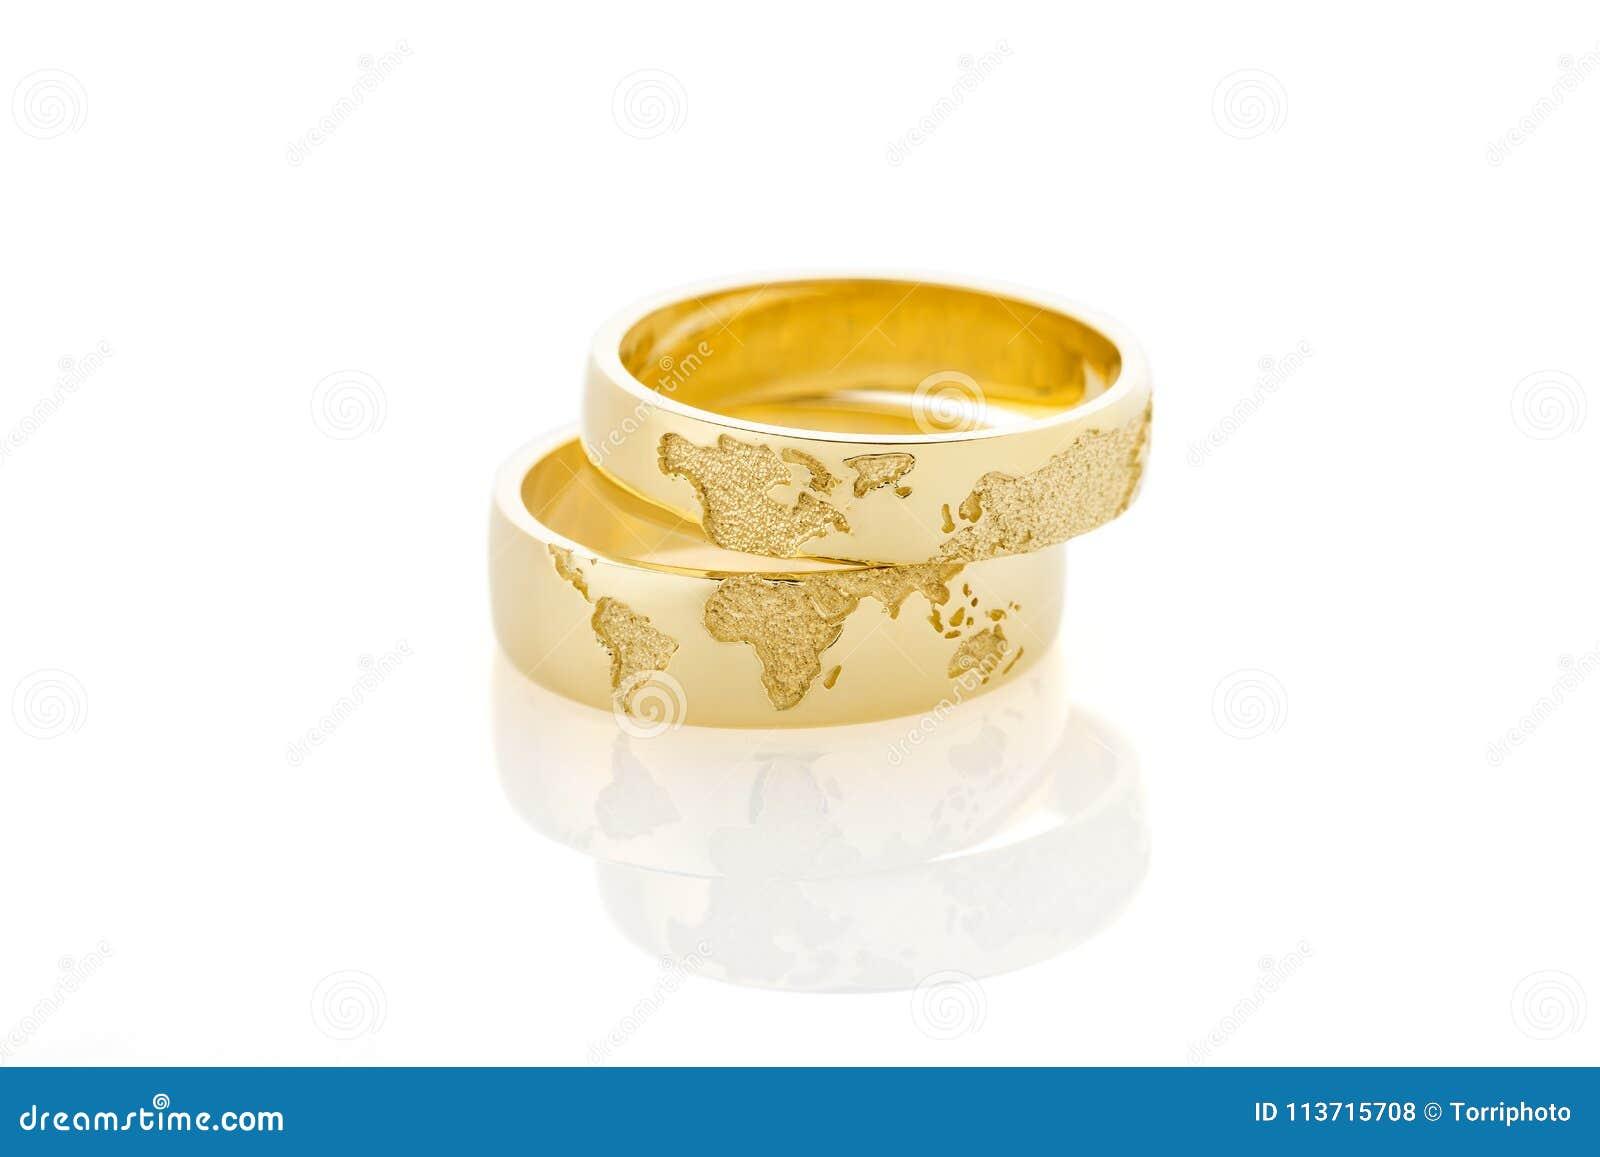 World Map Golden Wedding Rings Isolated On White Background Stock